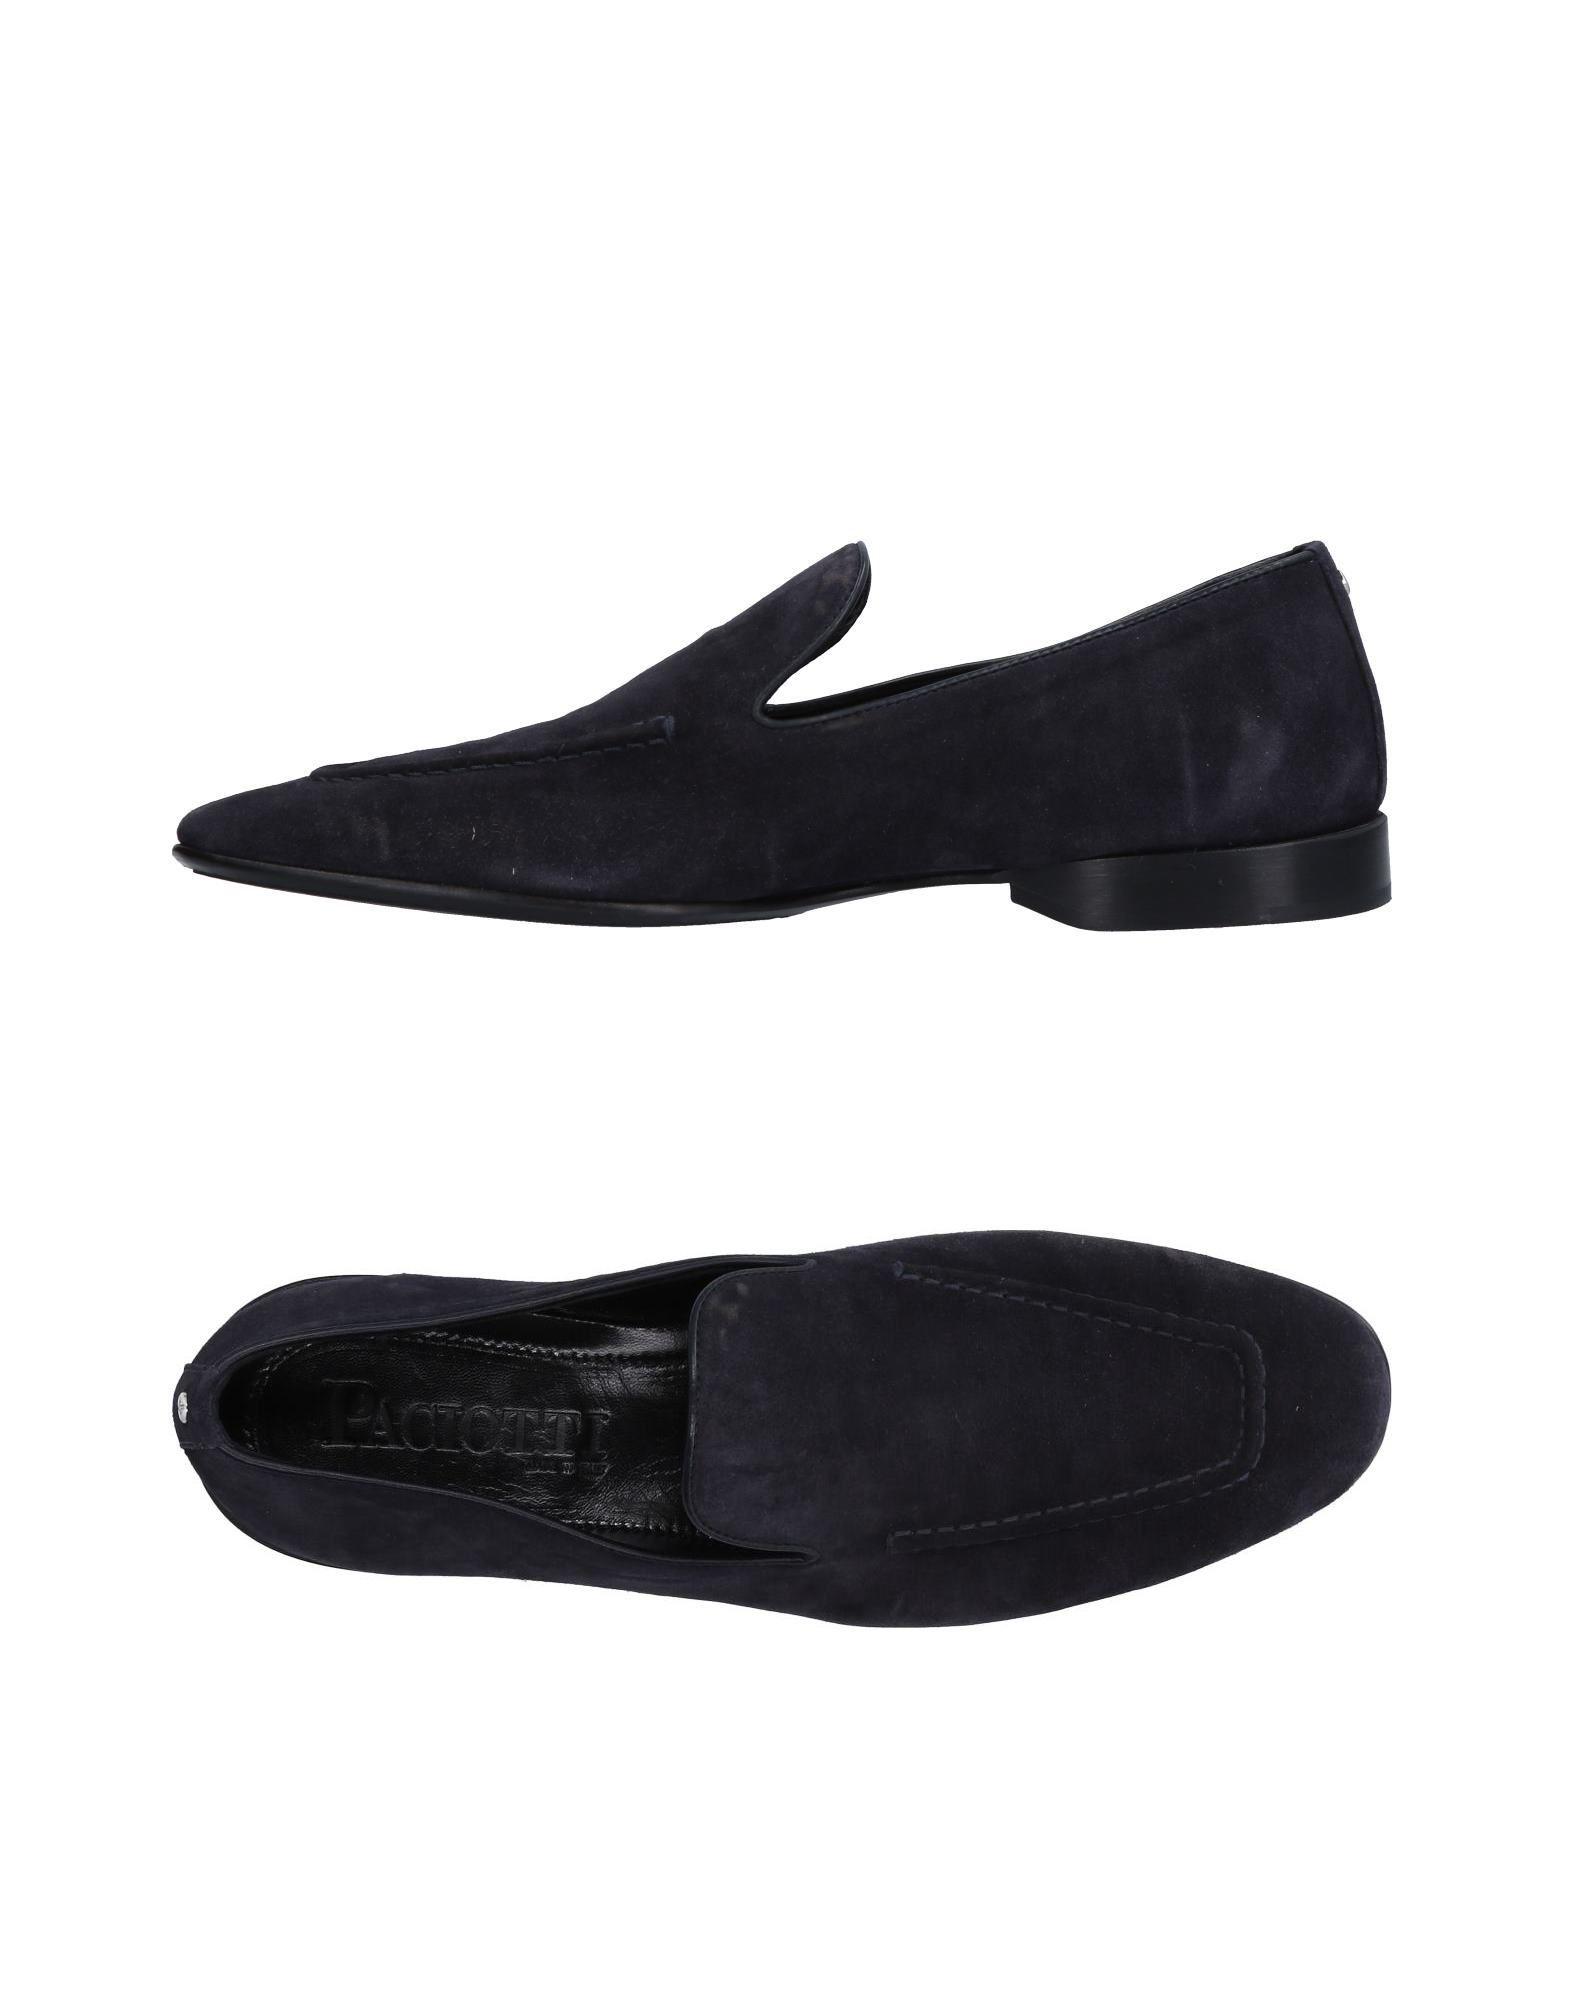 Cesare Paciotti Mokassins Herren  11506606VL Gute Qualität beliebte Schuhe